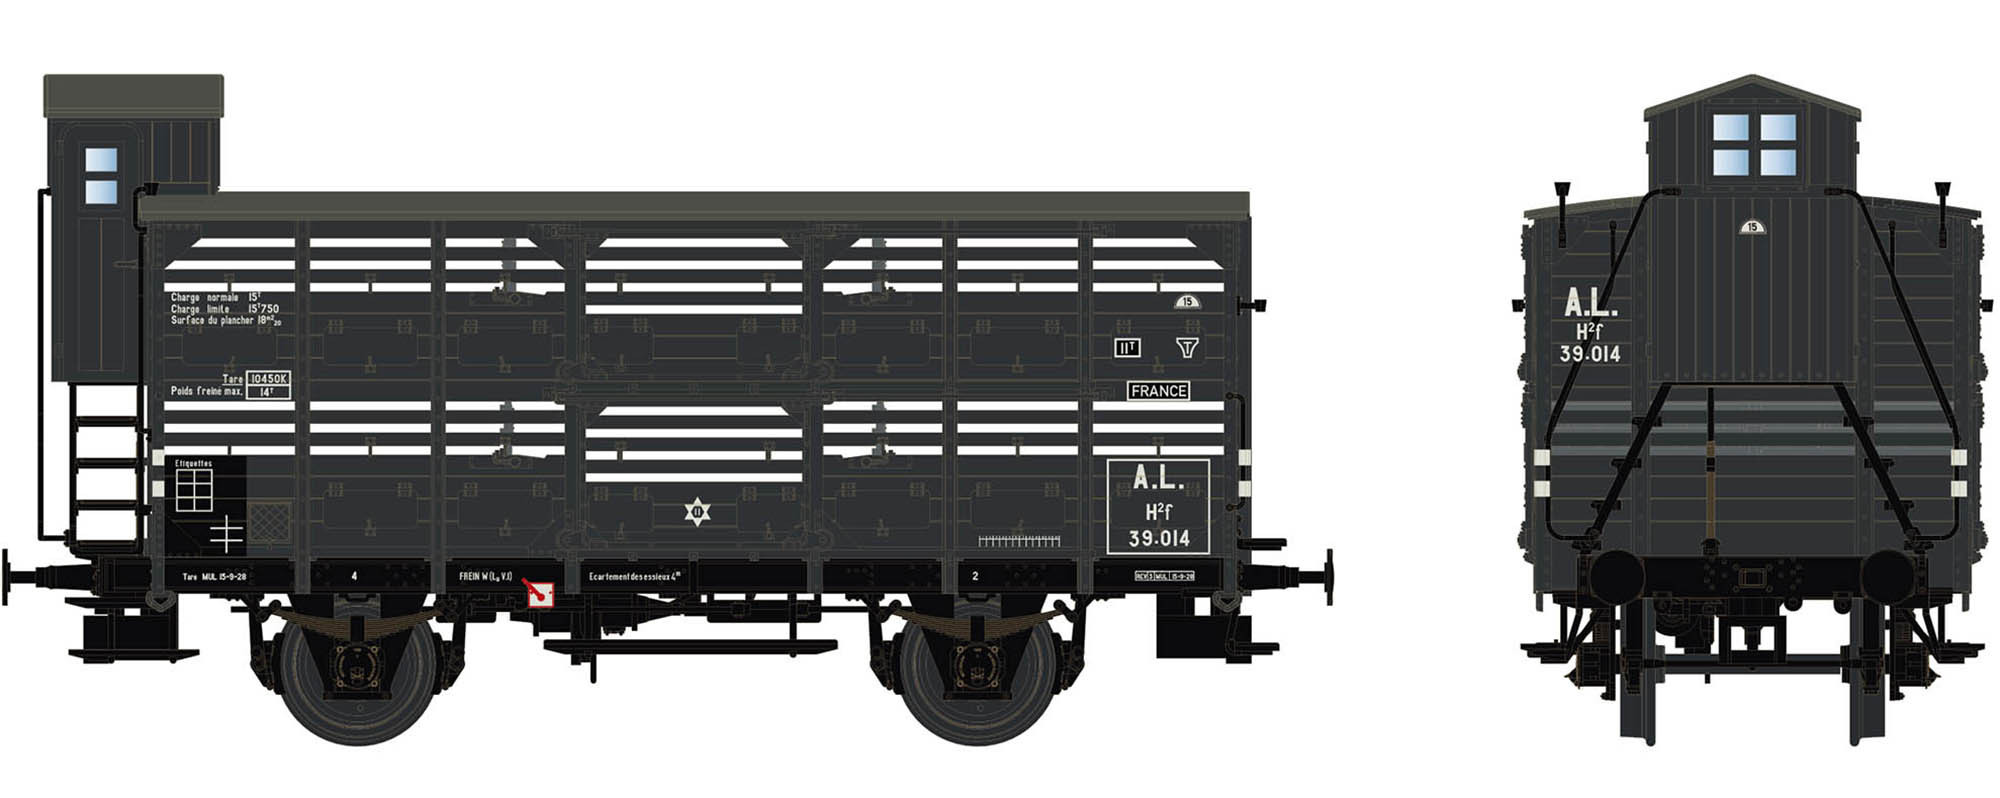 Wagenbausatz Verschlagwagen Vh14, A.L., Epoche II